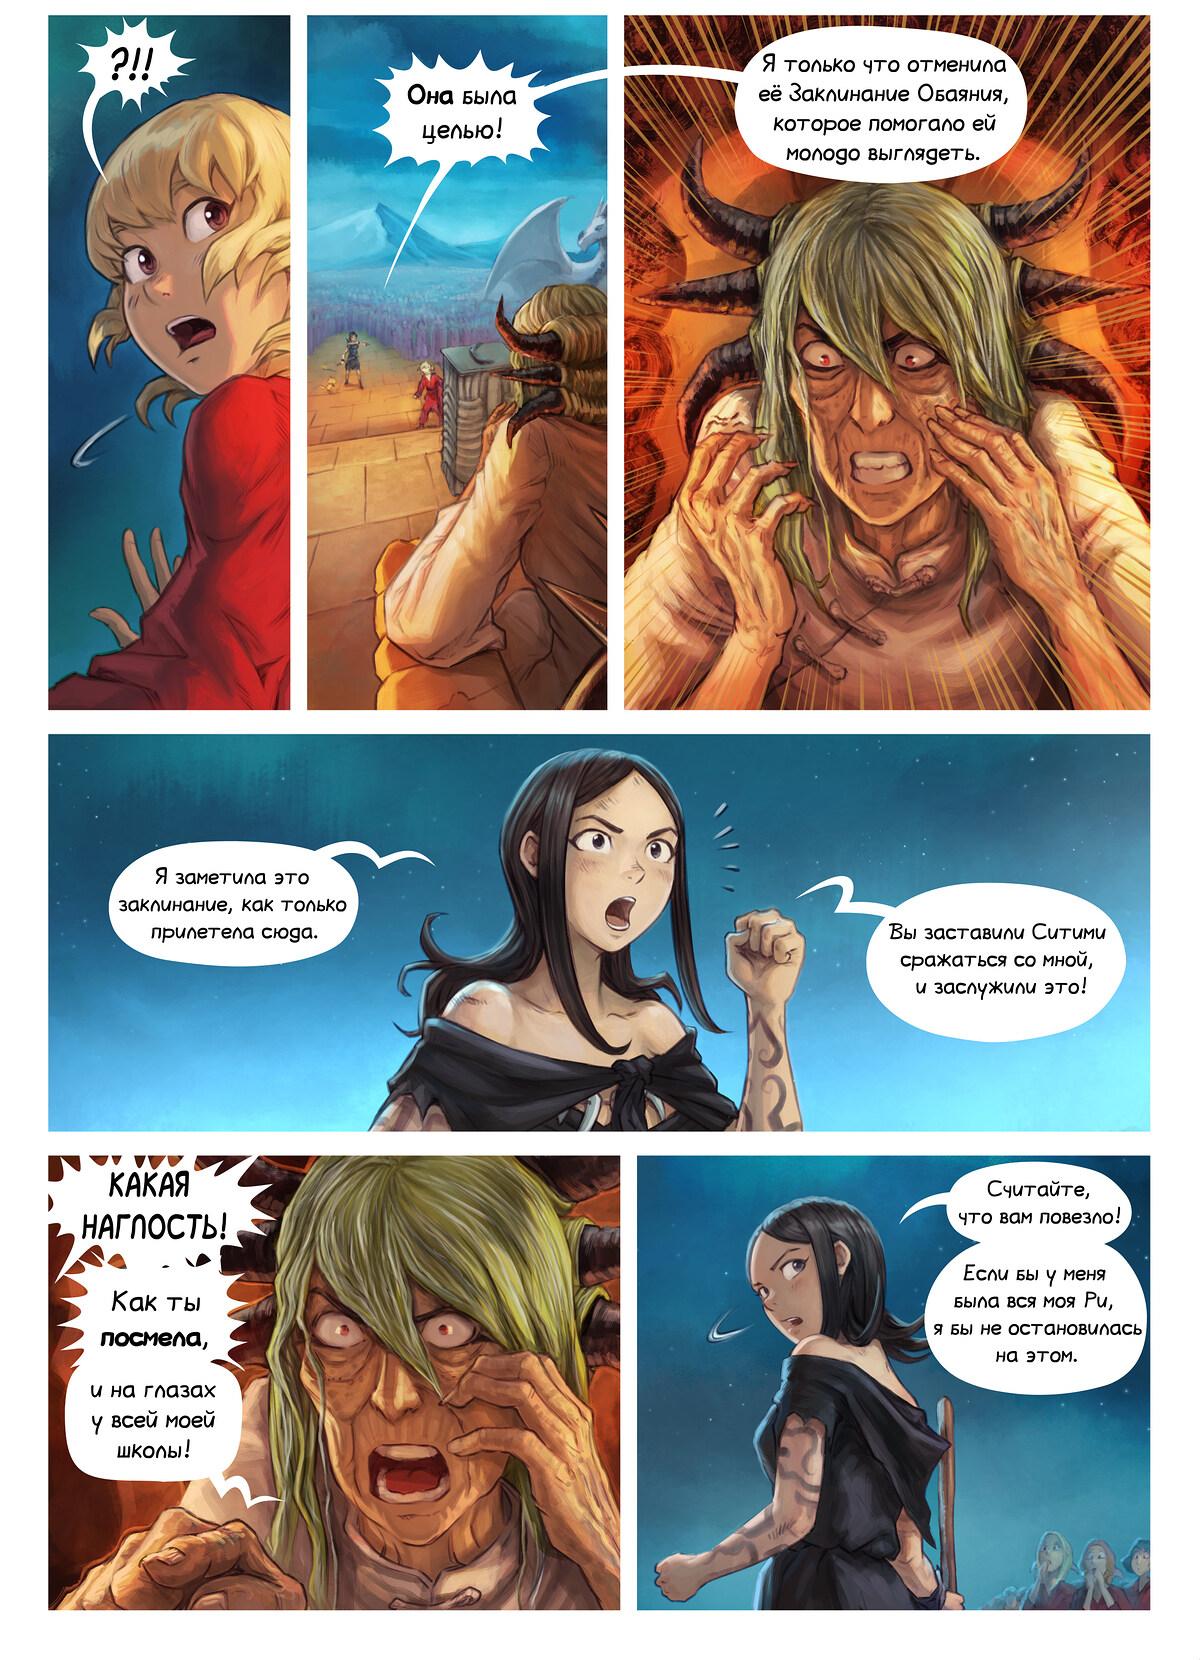 Эпизод 34: Посвящение Ситими, Page 8